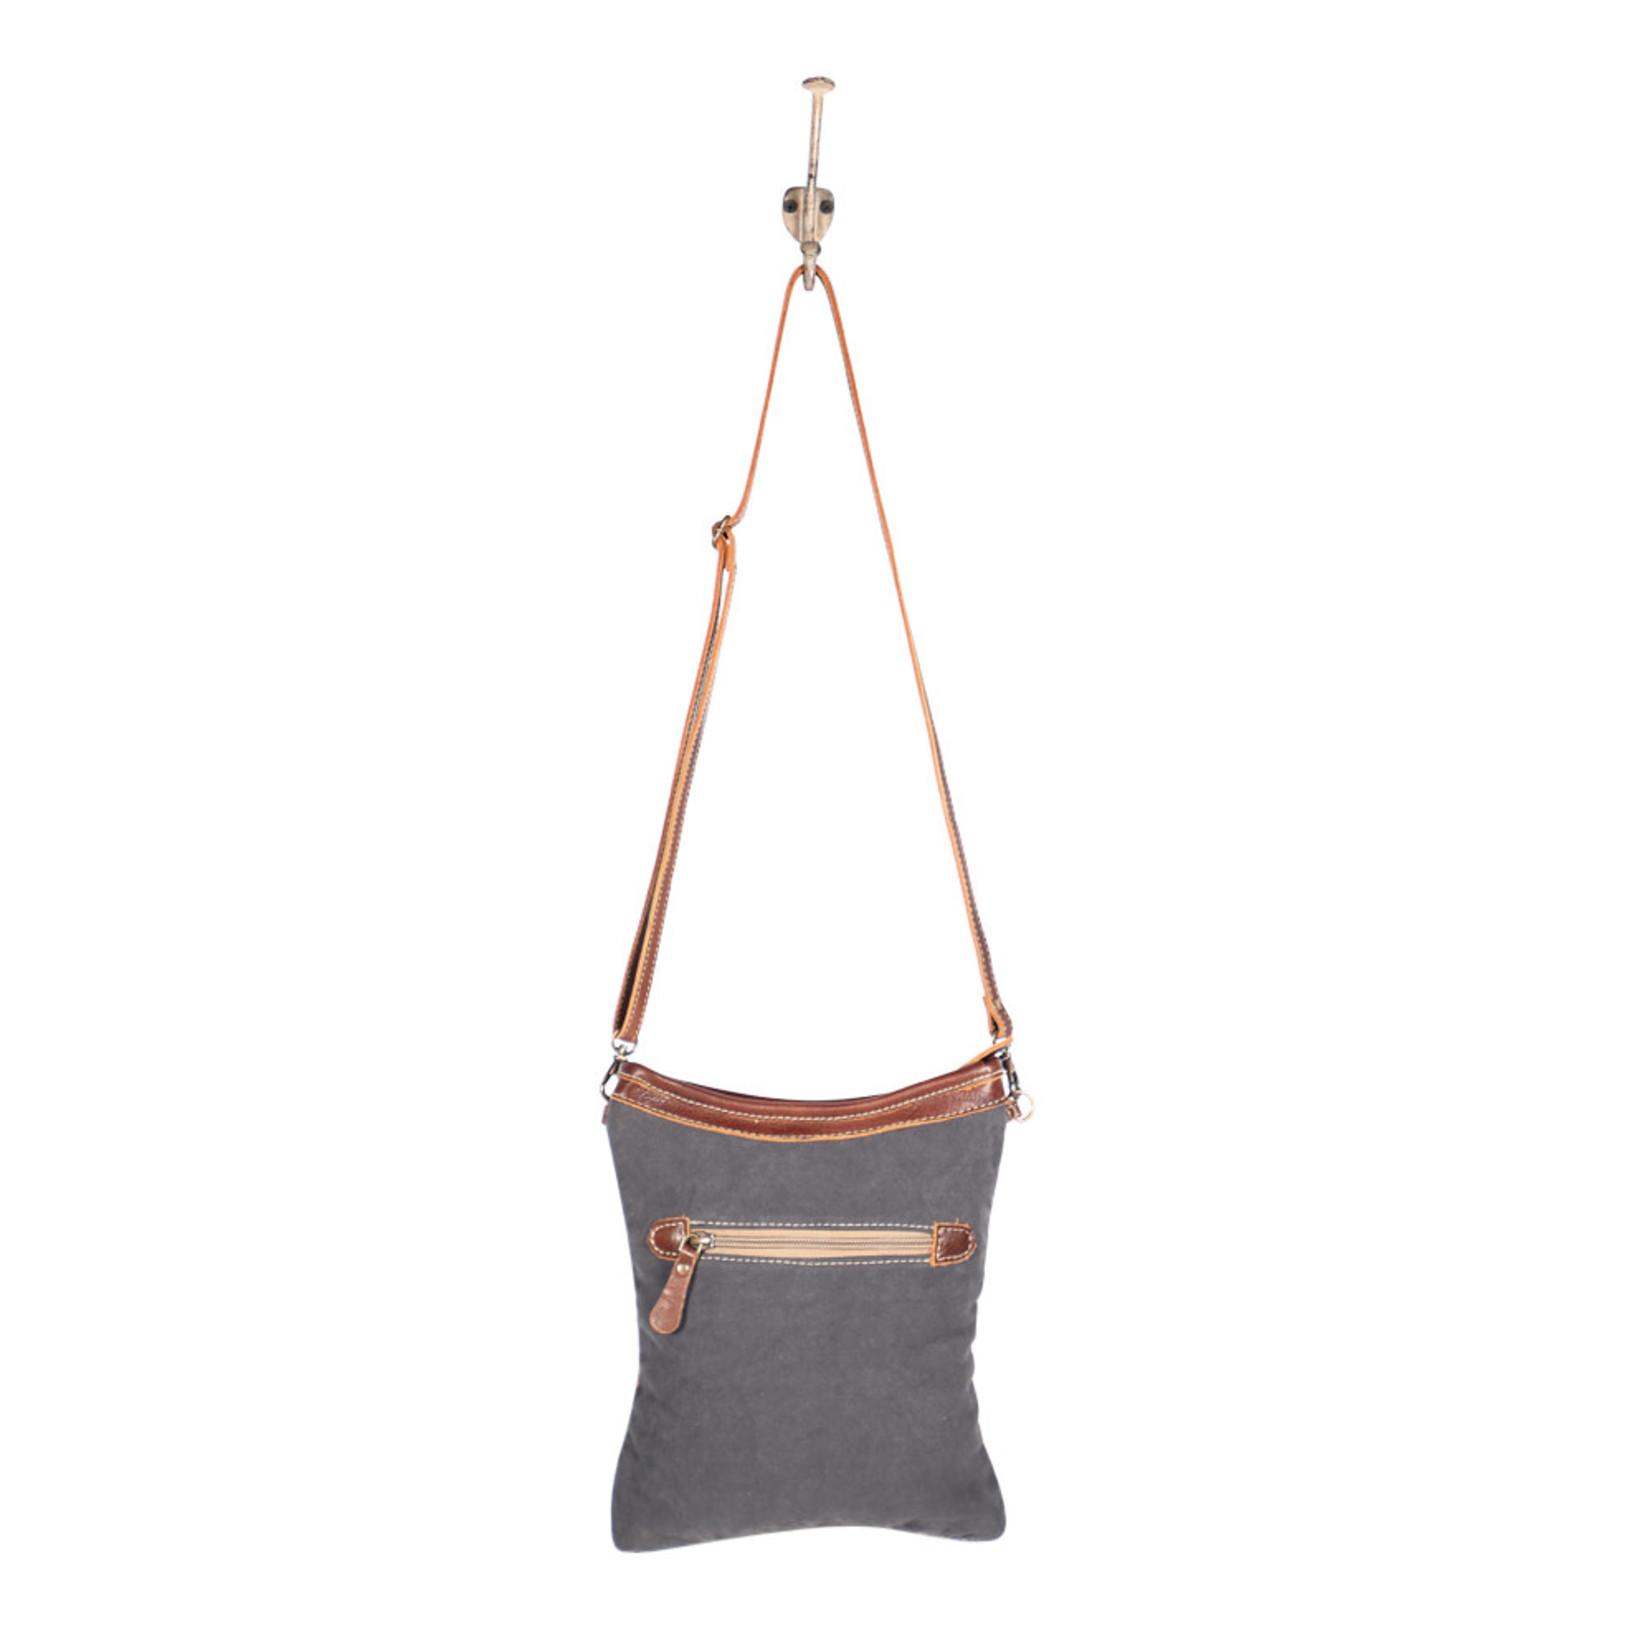 Myra Bags S-1908 Bloom Small & Crossbody Bag